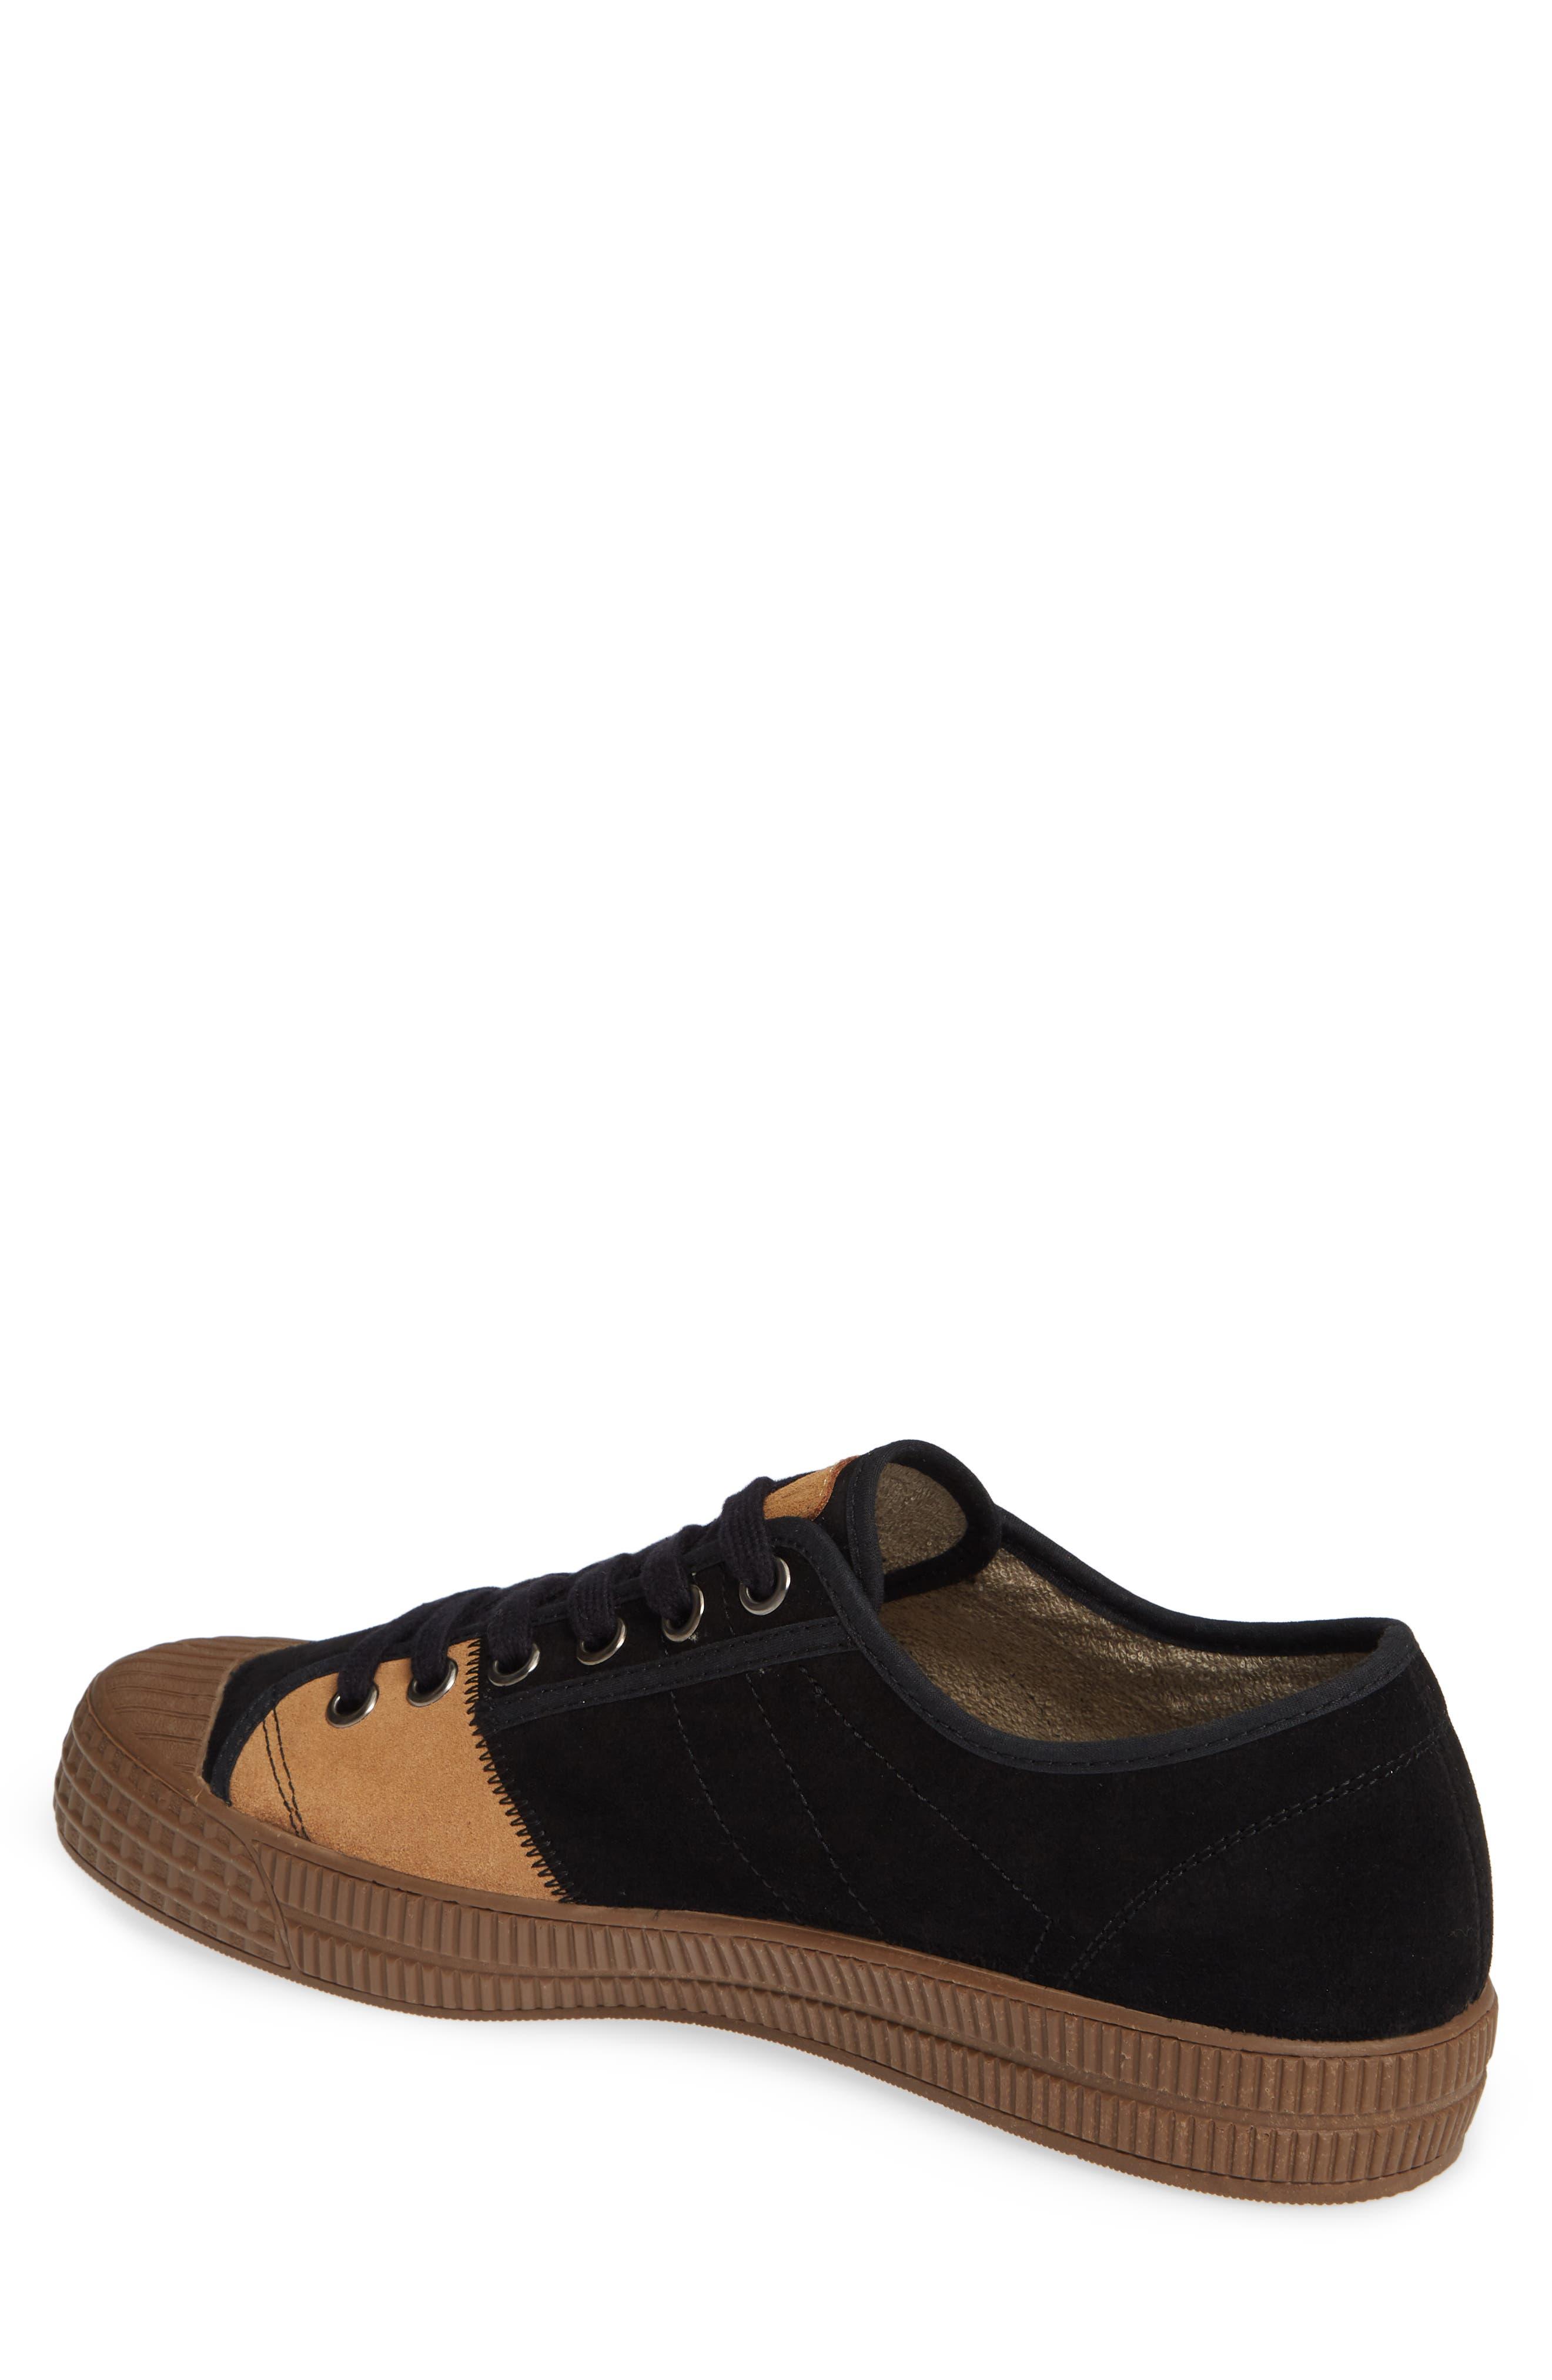 Foto Sneaker,                             Alternate thumbnail 2, color,                             BLACK/ CAMEL SUEDE